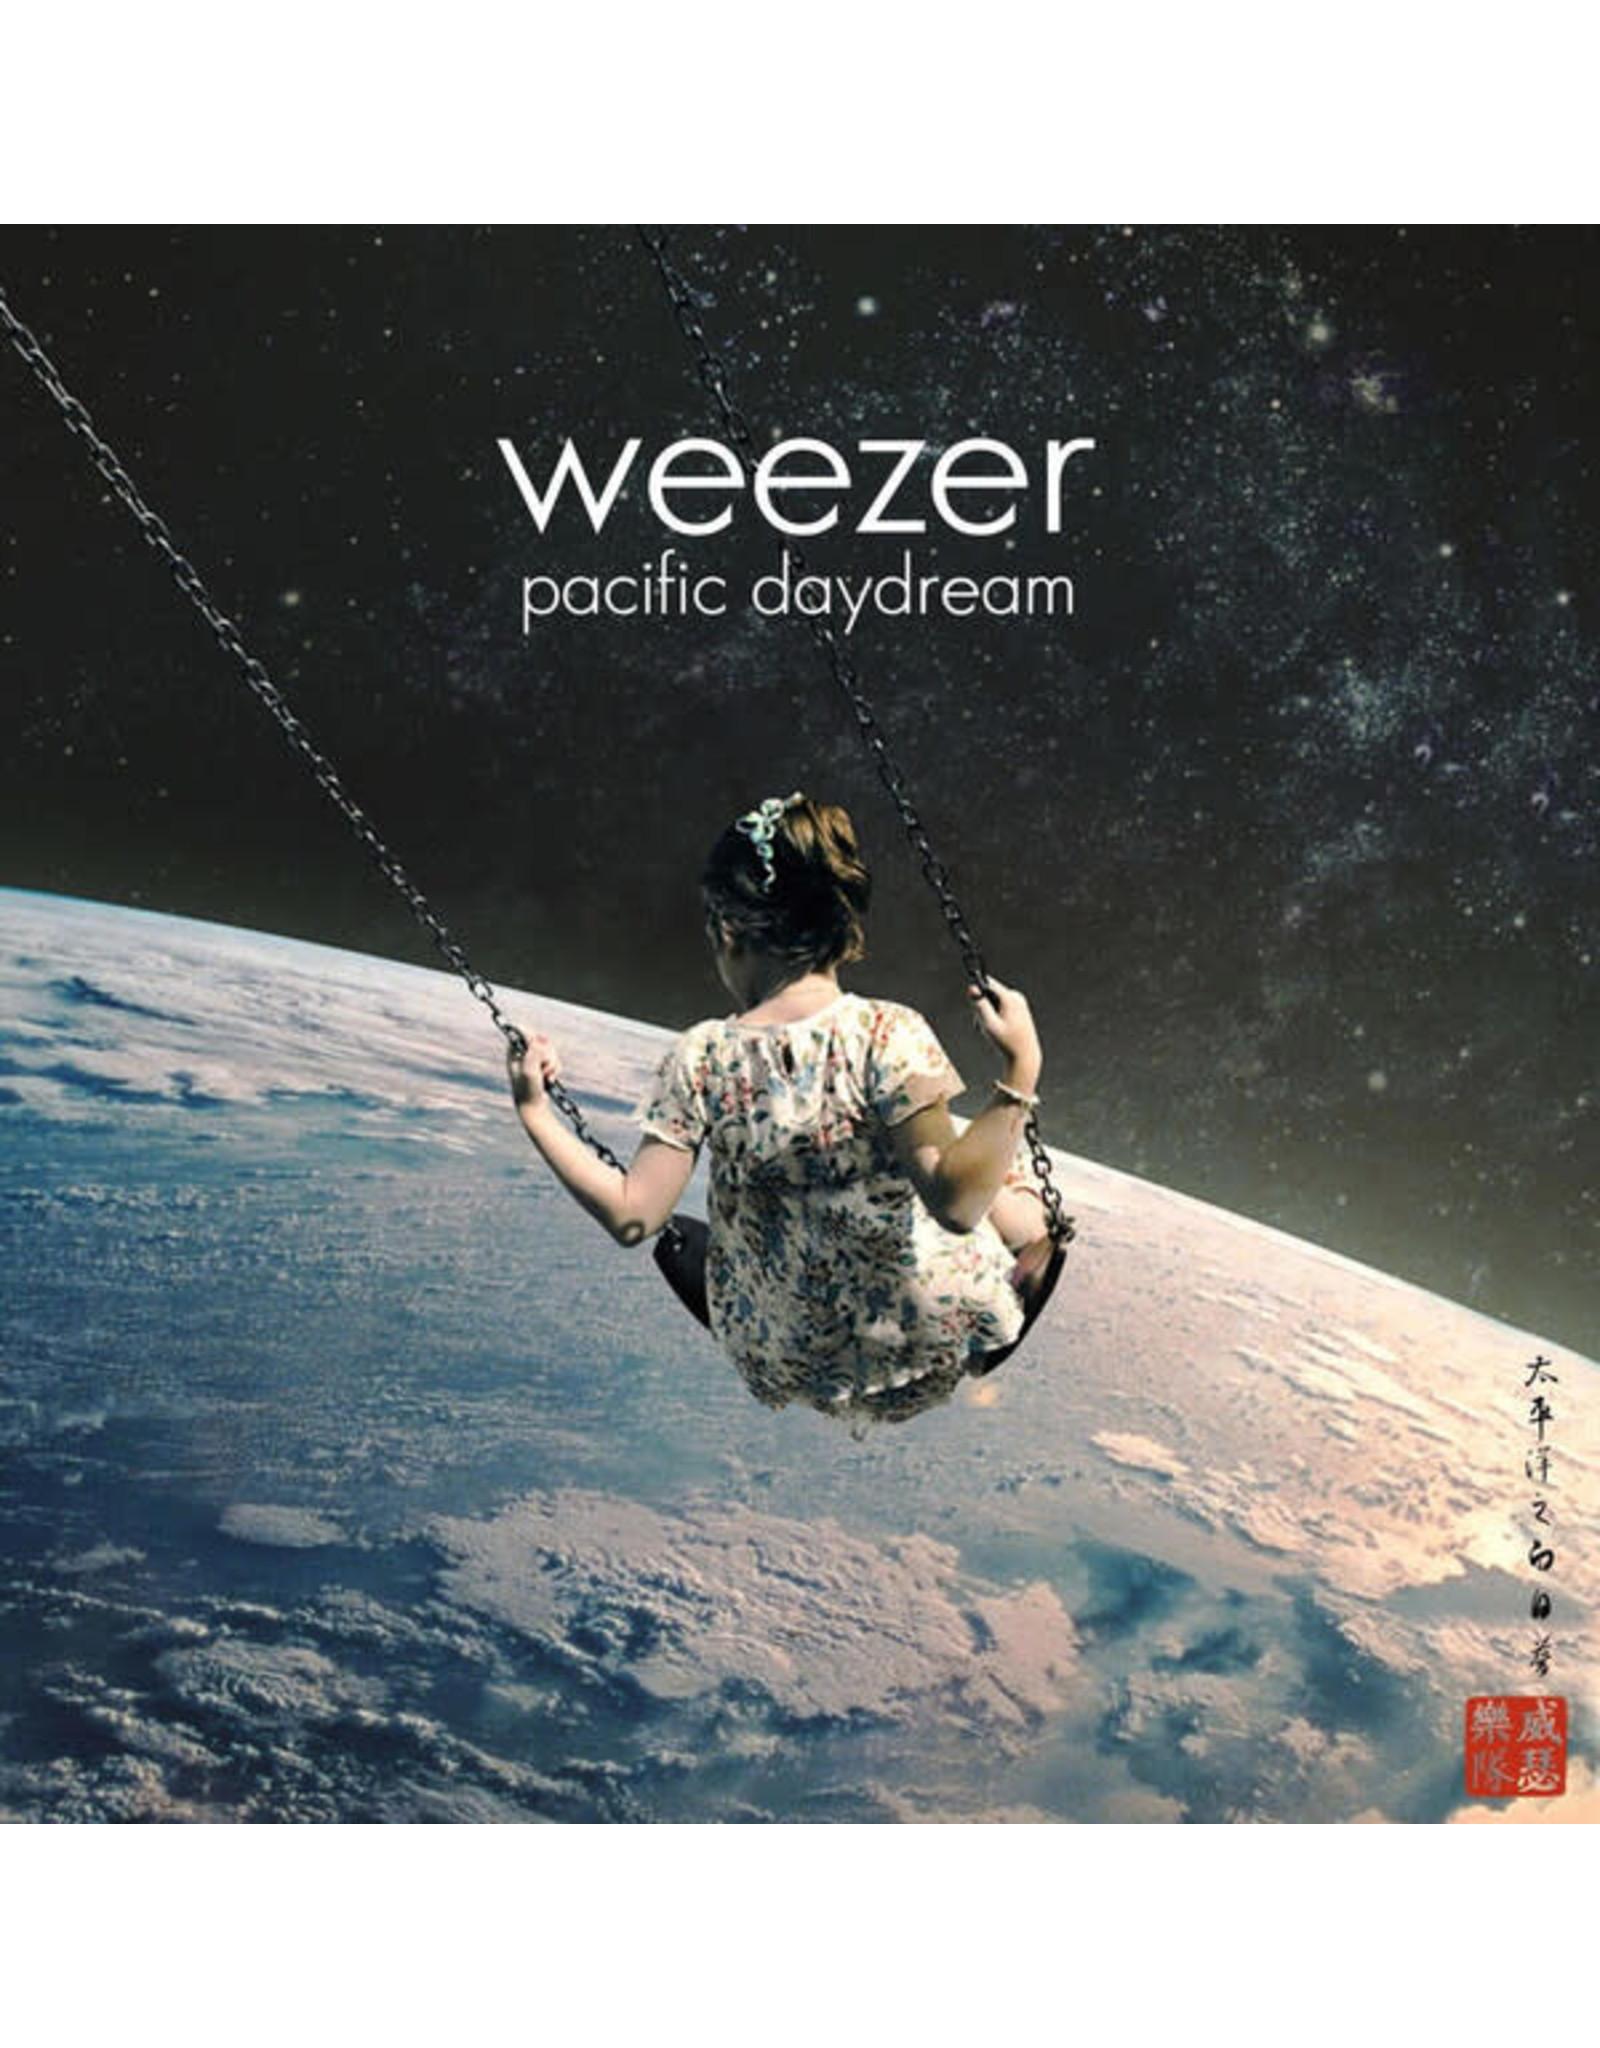 Weezer - Pacific Daydream CD